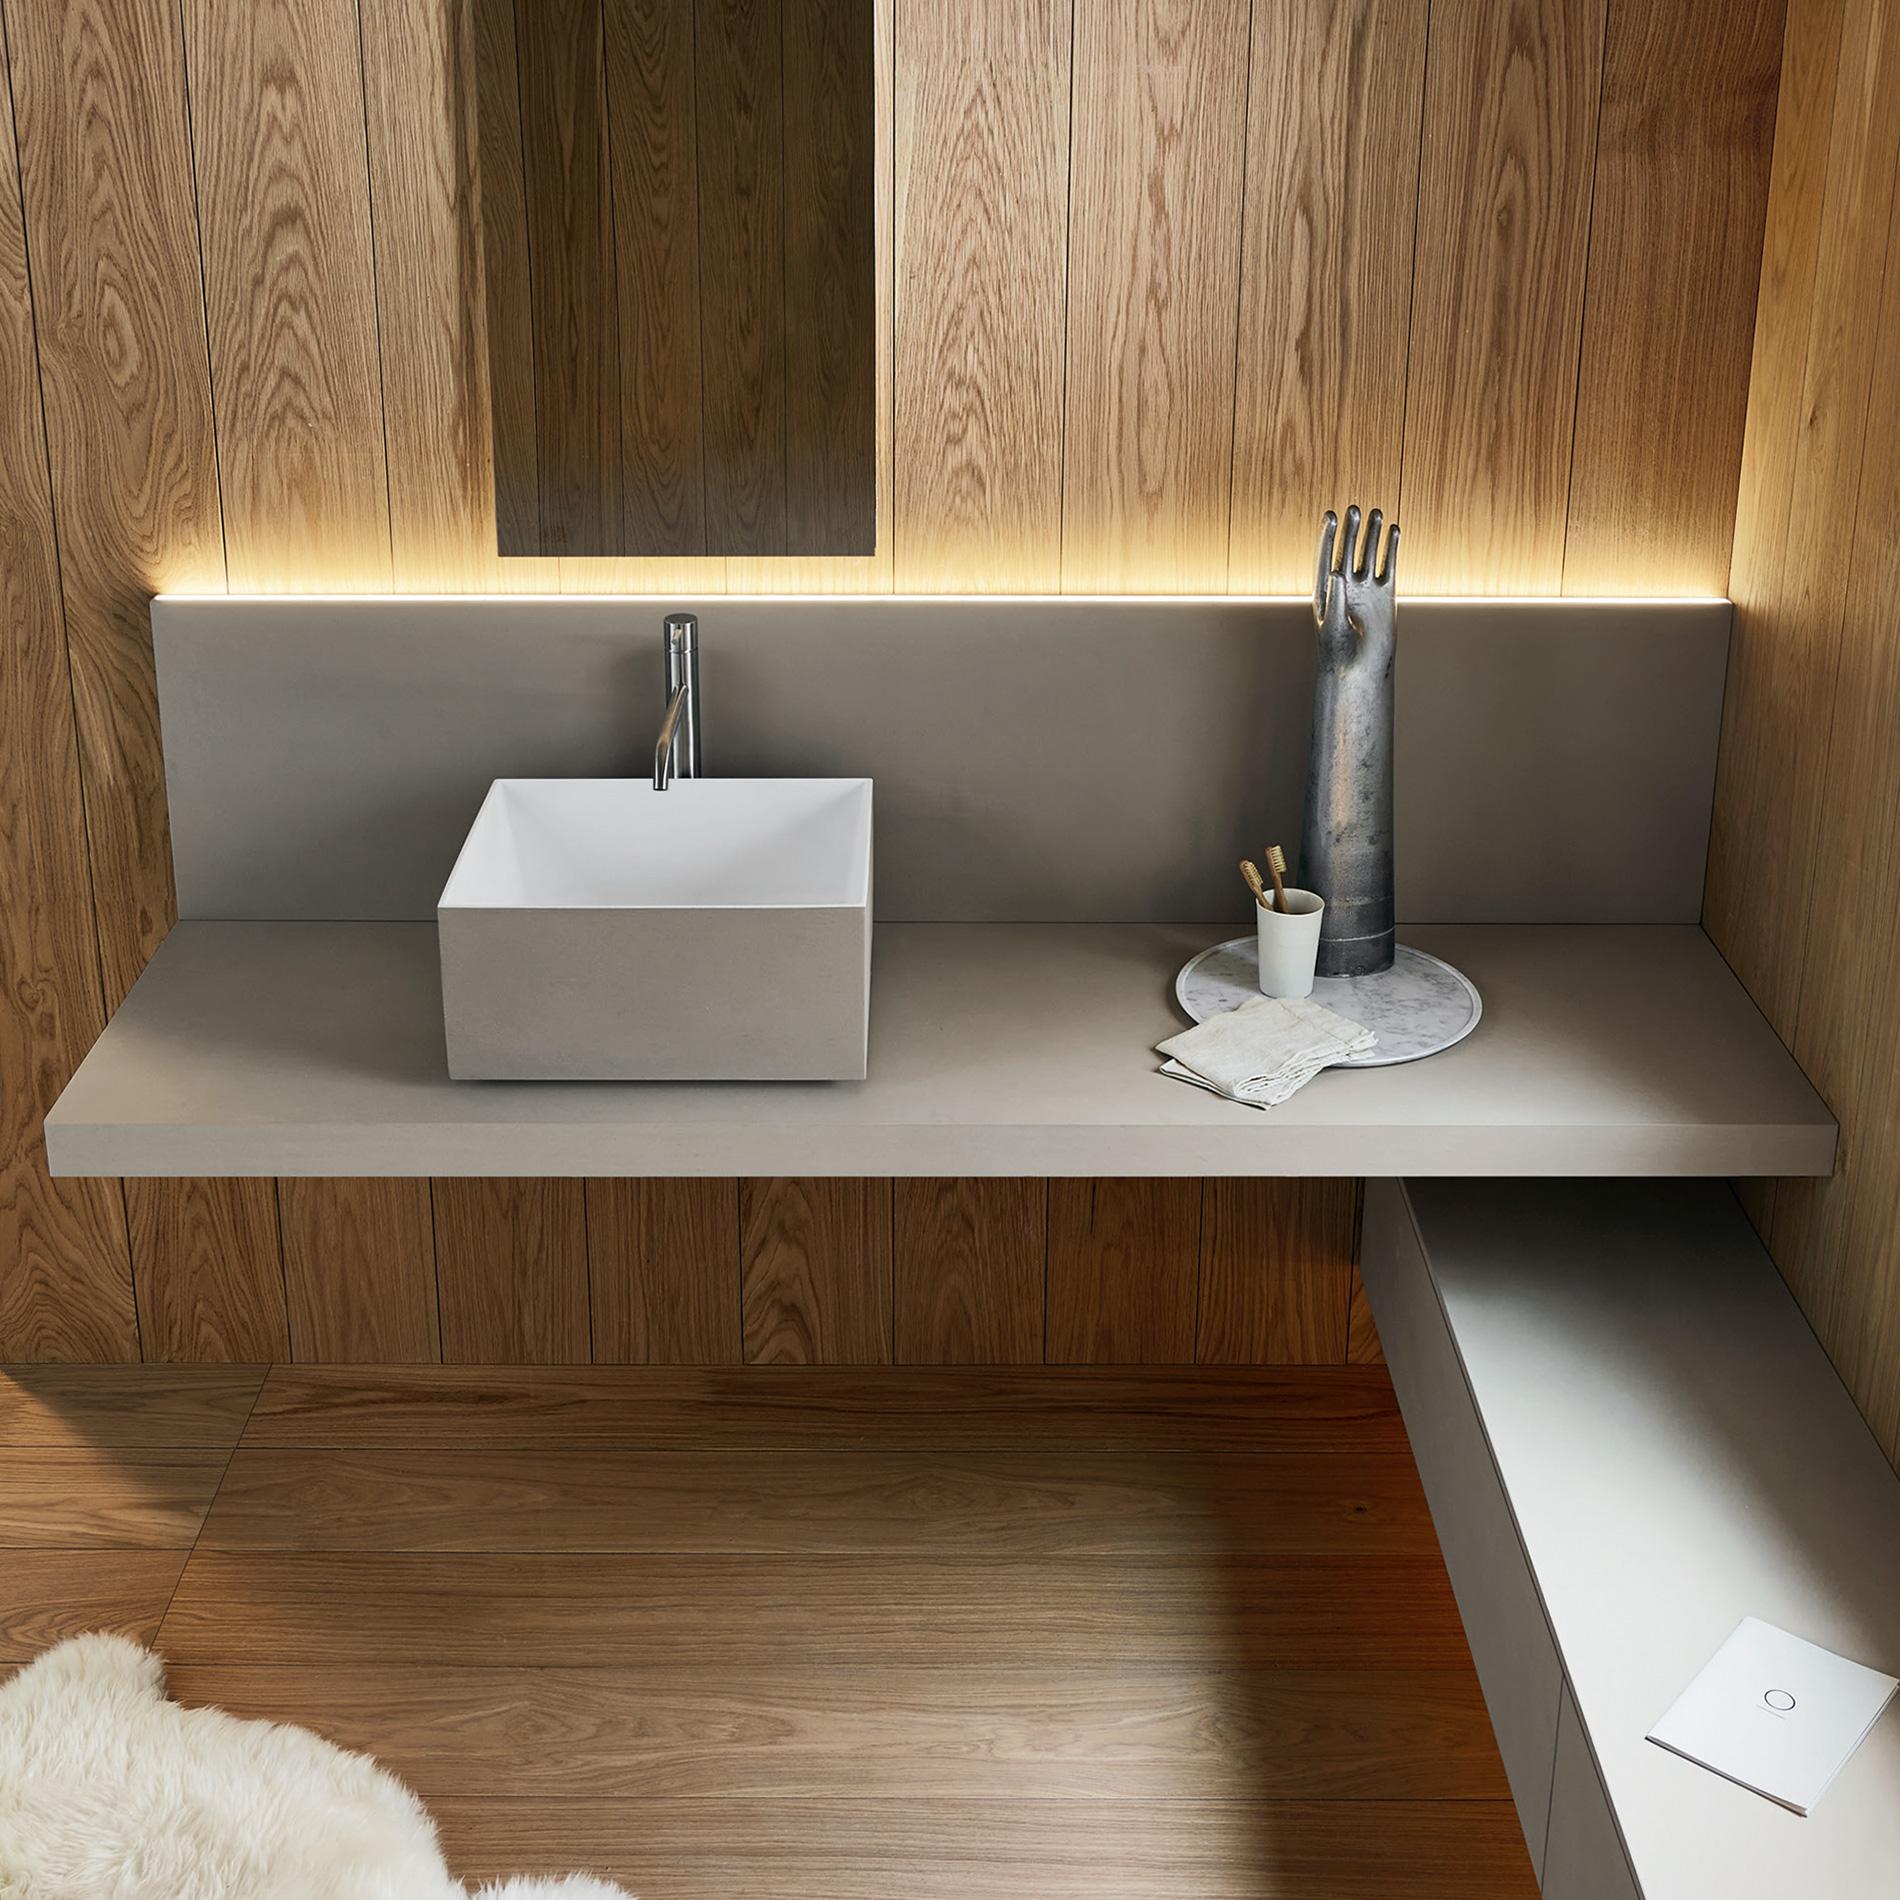 Nicos-International-home-products-Milldue-washbasins-2